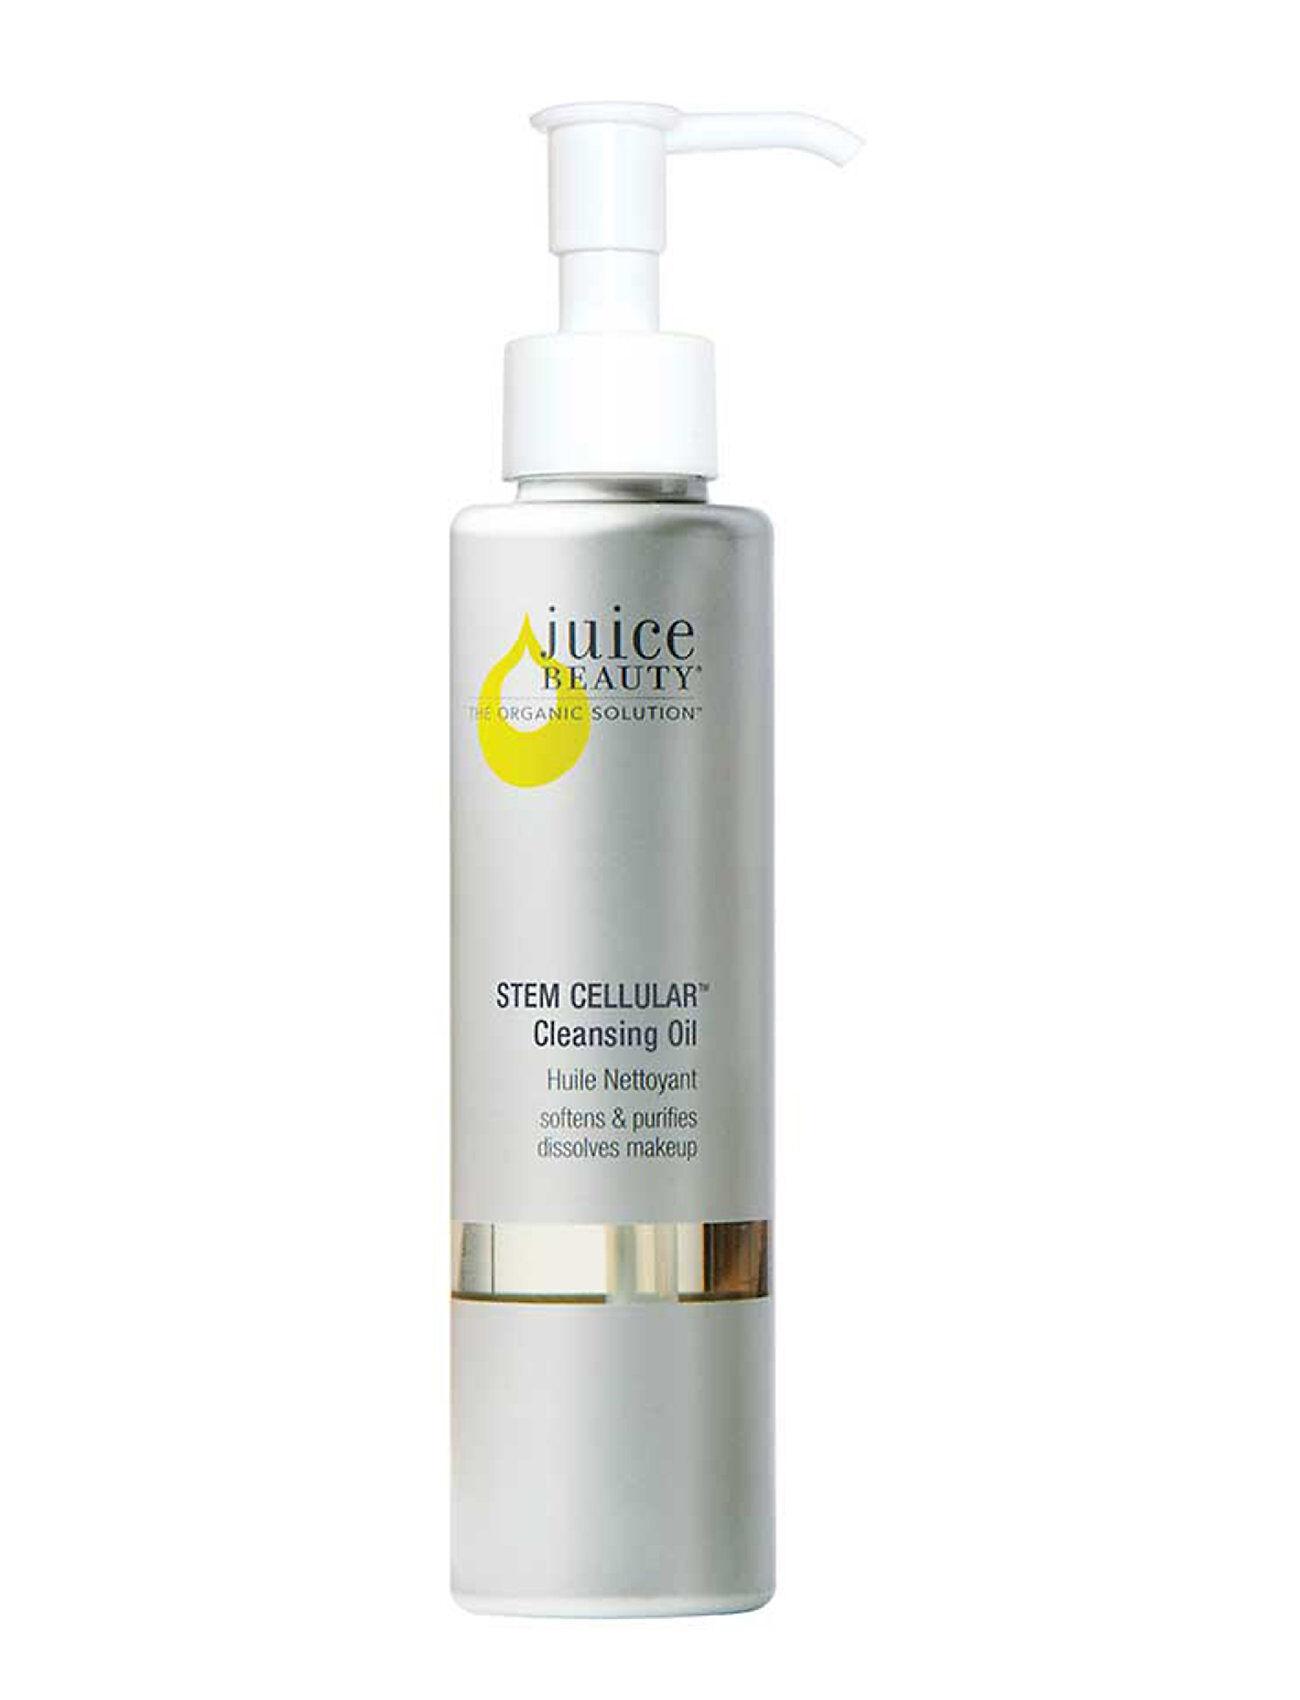 Juice Beauty Stem Cellular™ Cleansing Oil